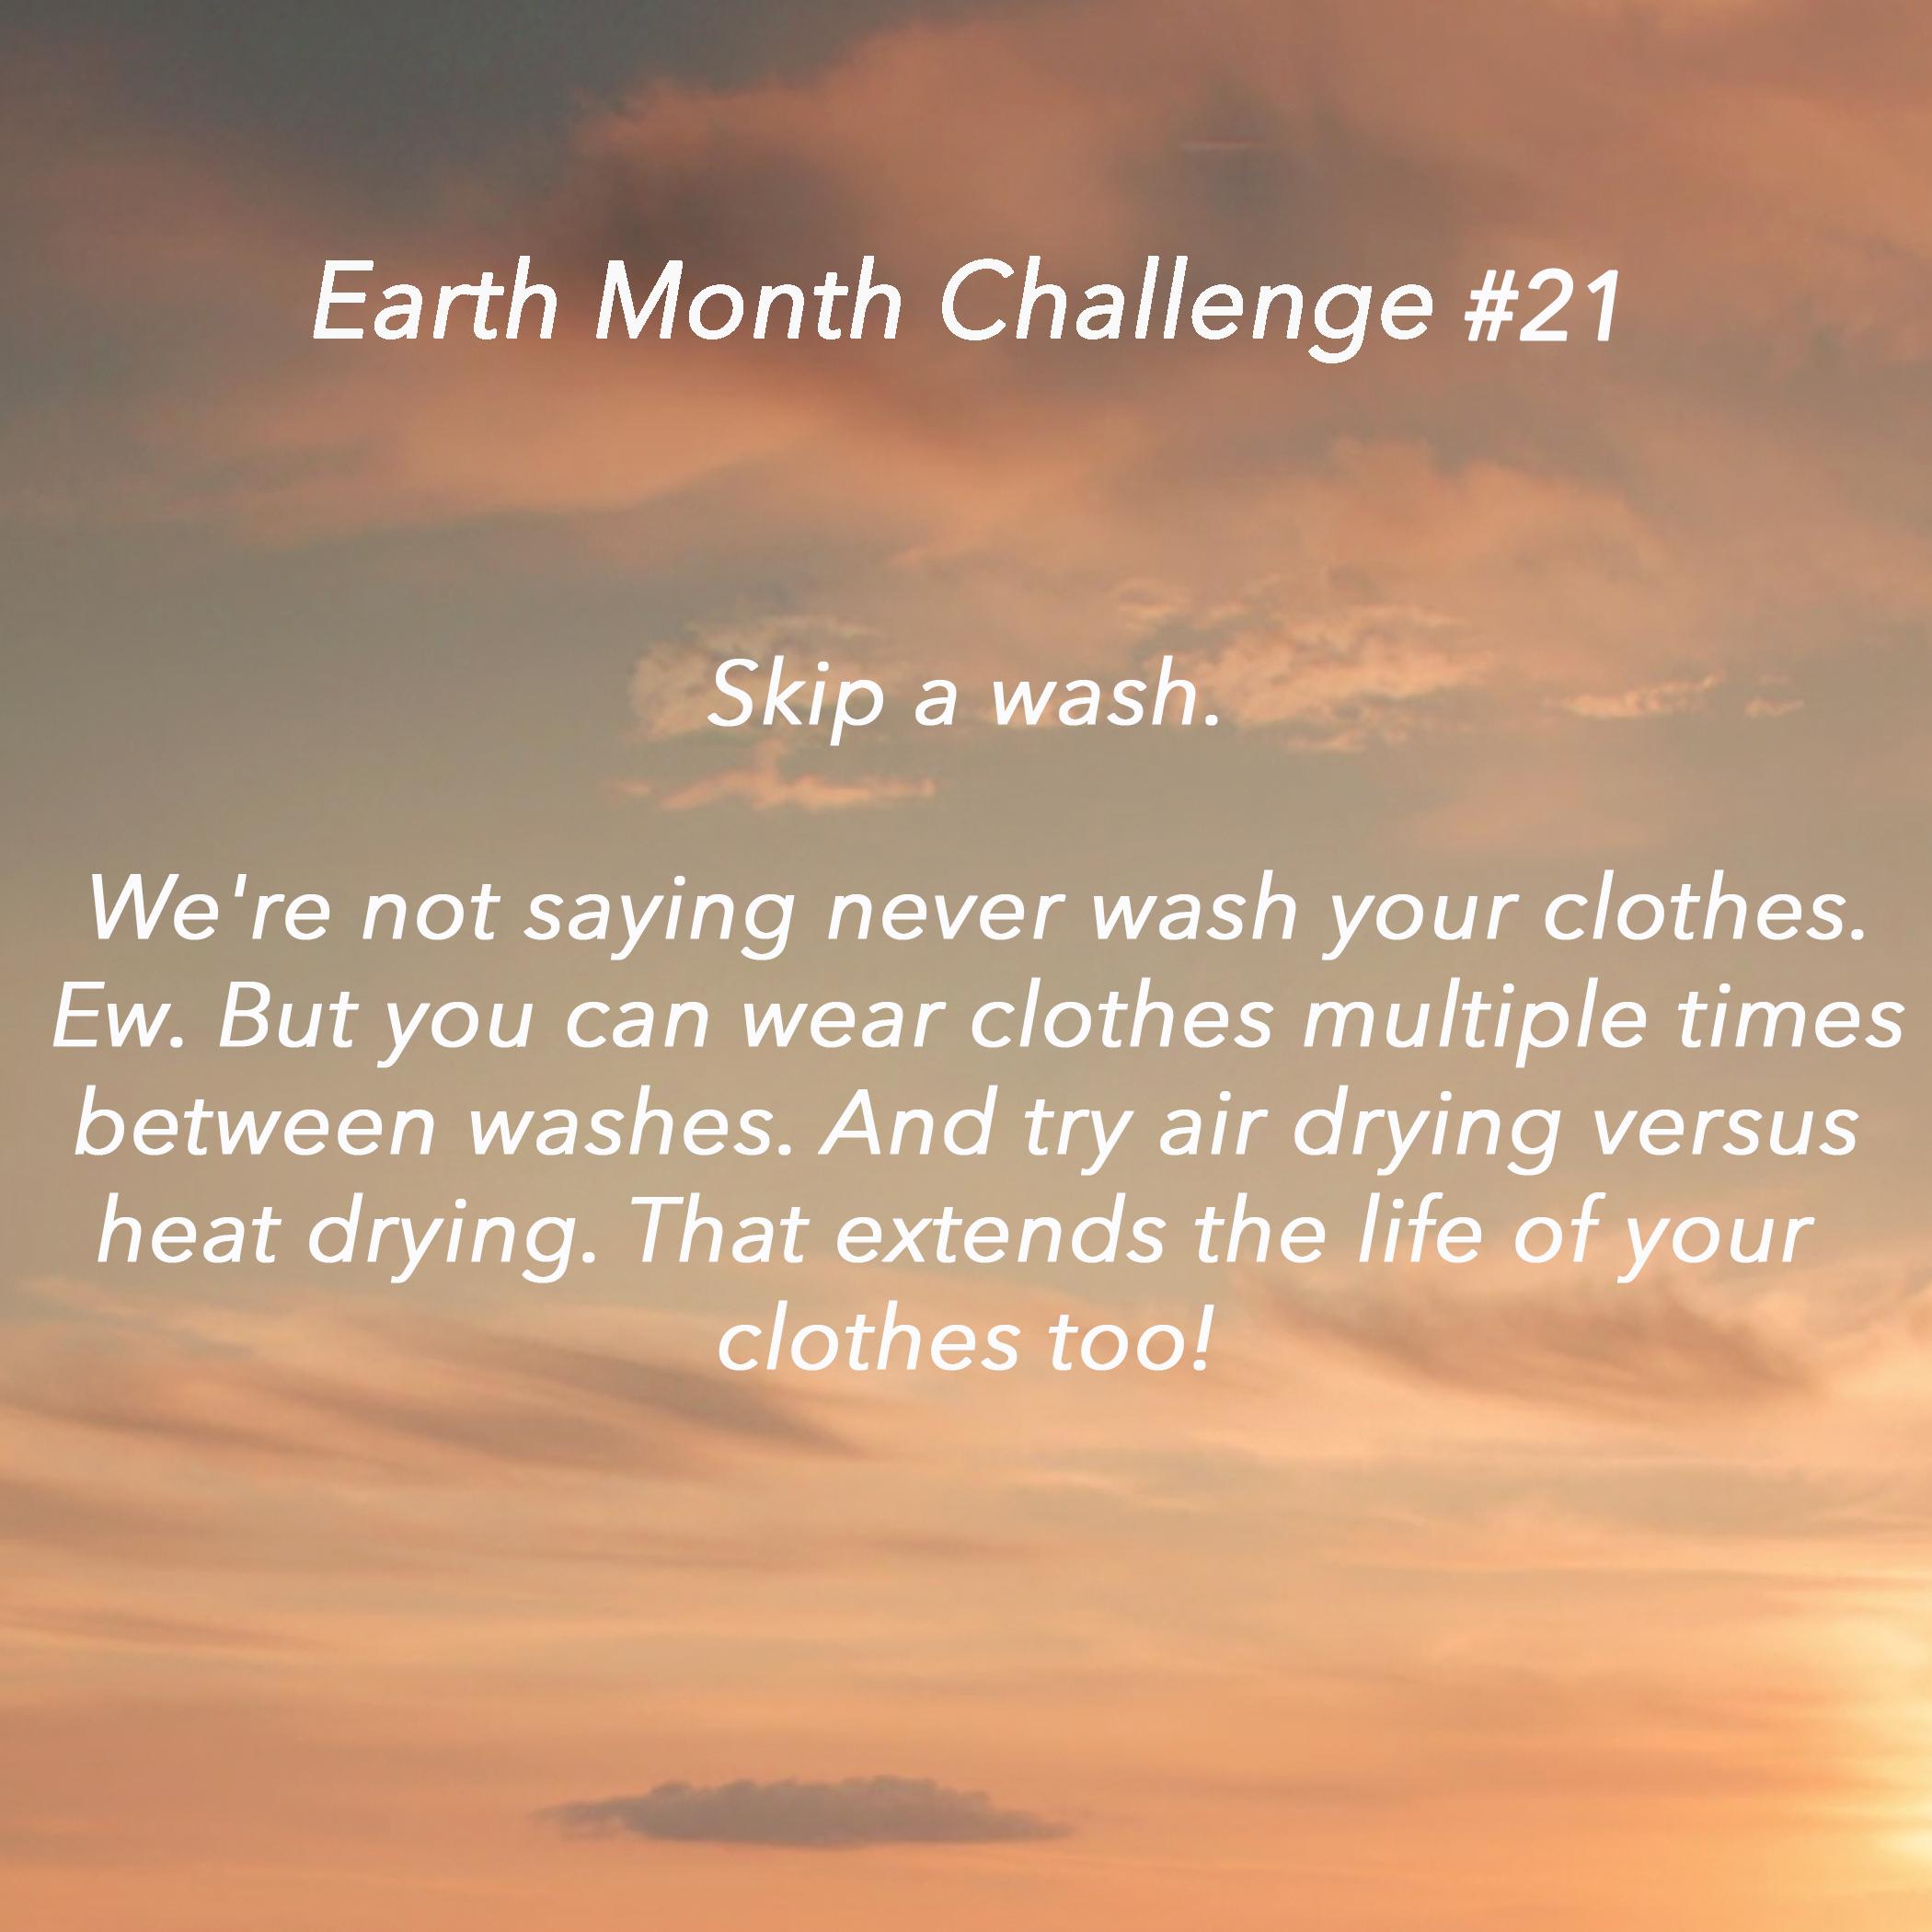 challenge_21.jpg